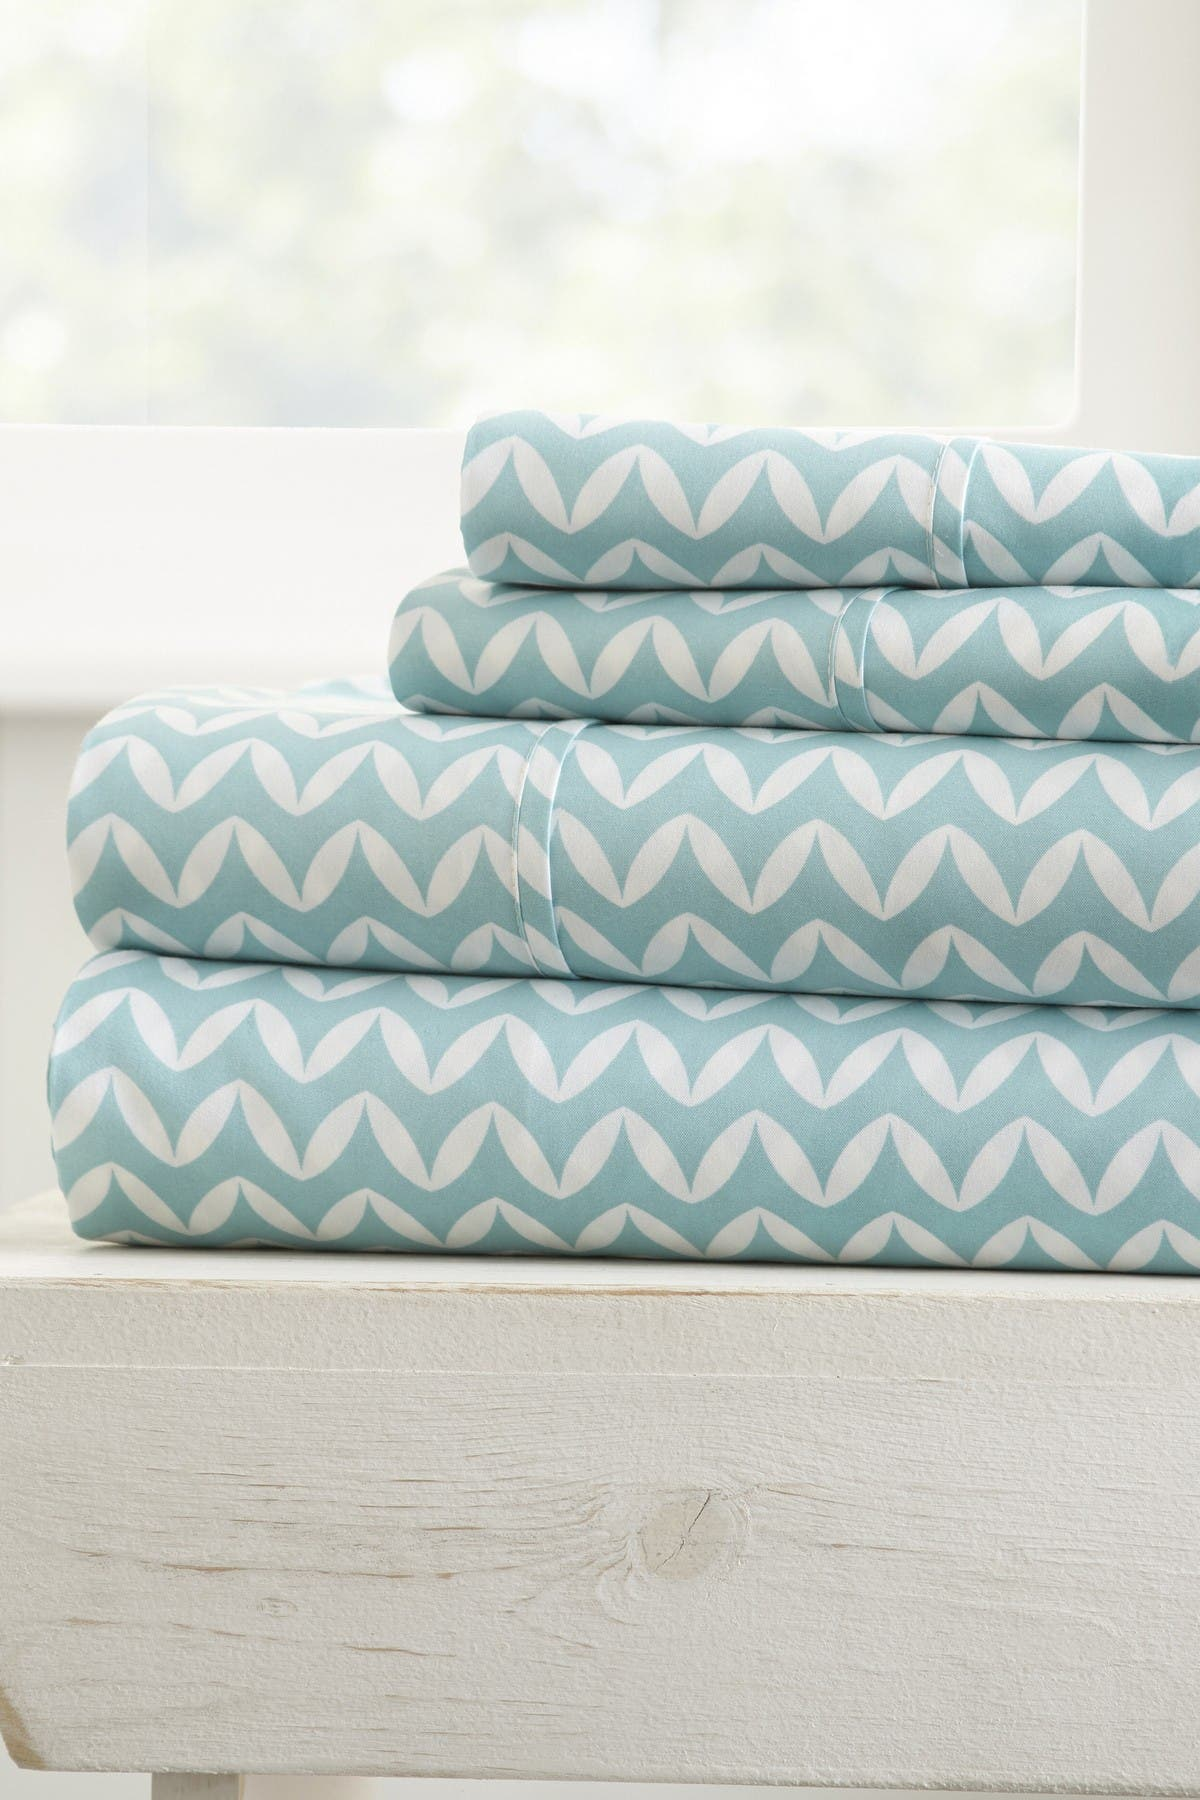 Image of IENJOY HOME Home Spun Premium Ultra Soft Puffed Chevron Pattern 4-Piece California King Bed Sheet Set - Light Blue